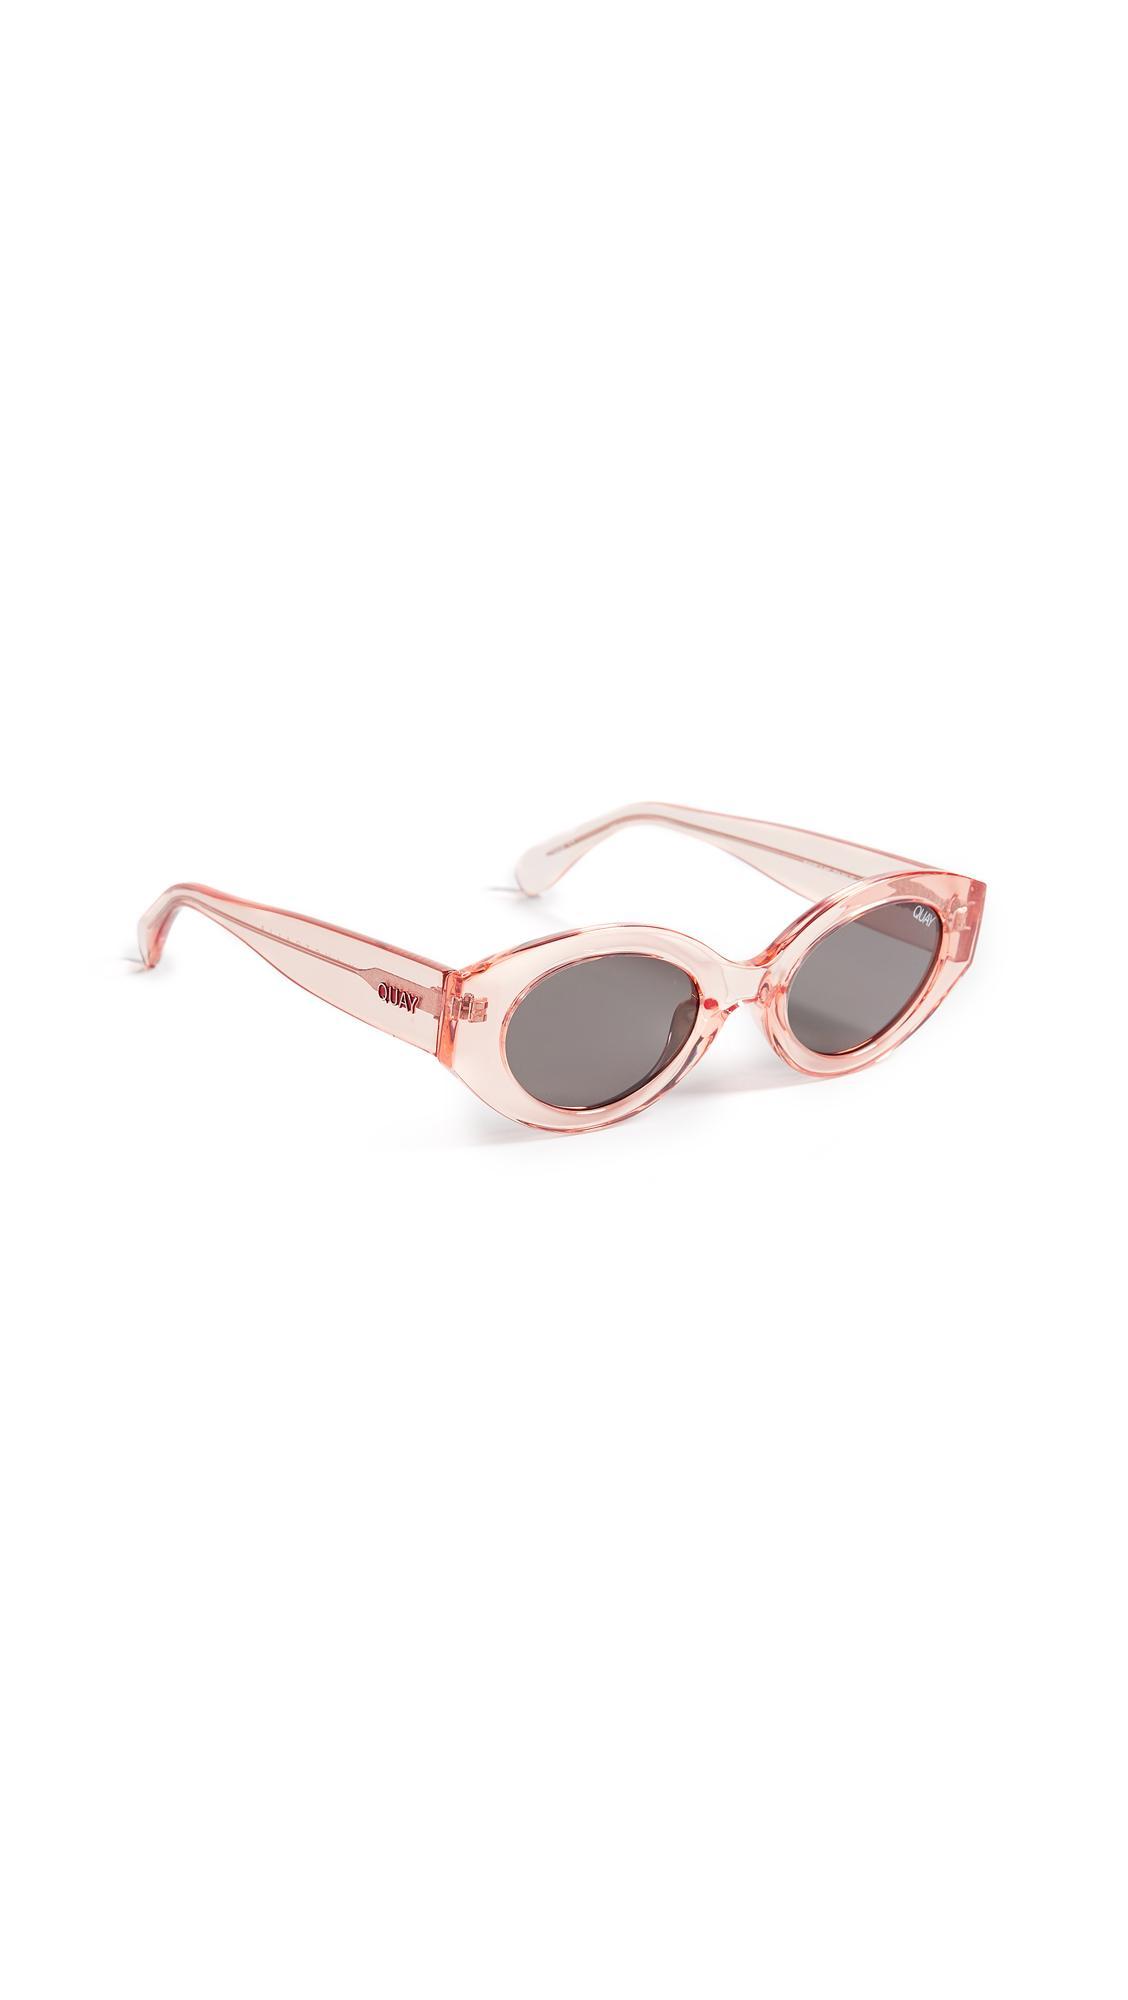 10a14ada99b Quay See Me Smile 50Mm Cat Eye Sunglasses - Rose  Smoke In Rose Smoke